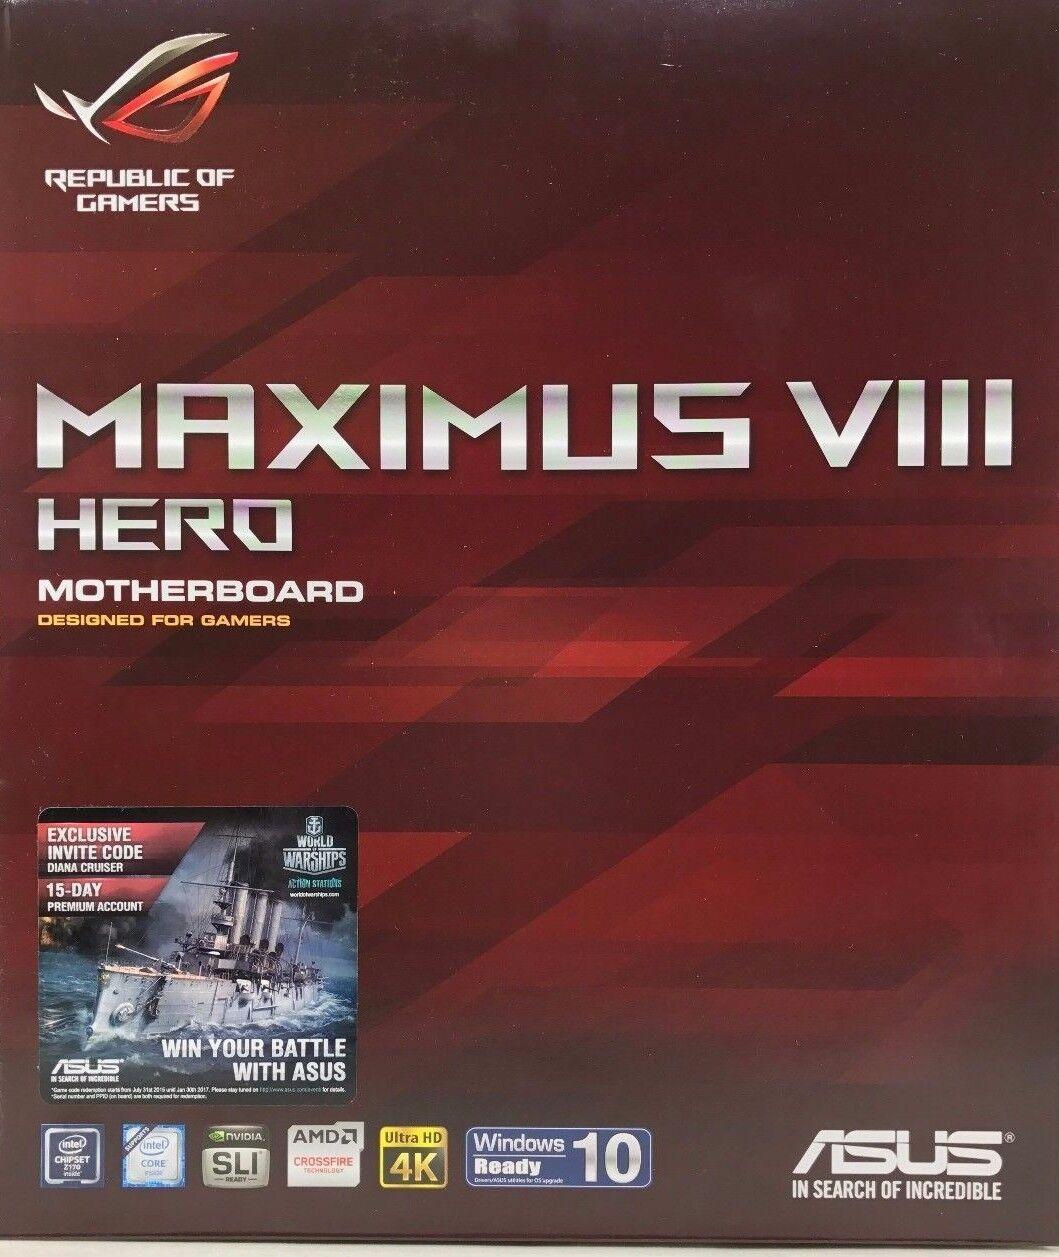 Asus Rog Maximus Viii Hero Lga1151 Ddr4 M.2 Sata 6gbs Usb 3.1 Motherboard